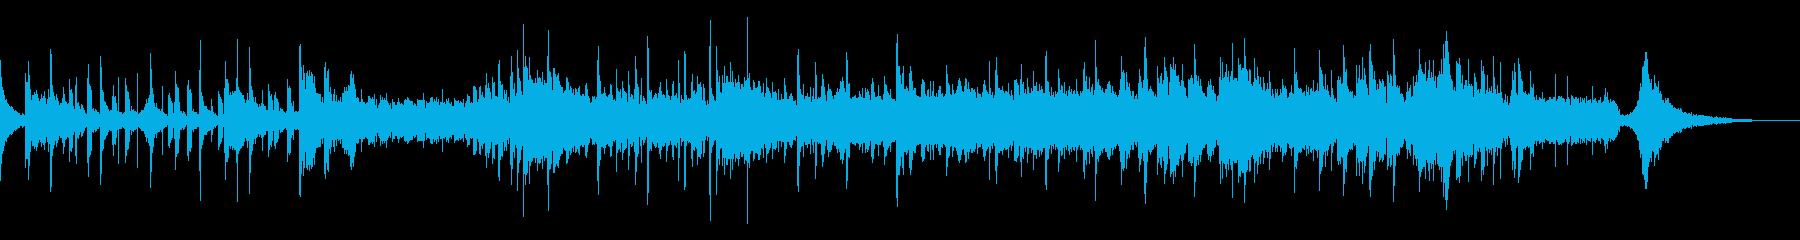 ORKSTRAVAGANZAバスド...の再生済みの波形